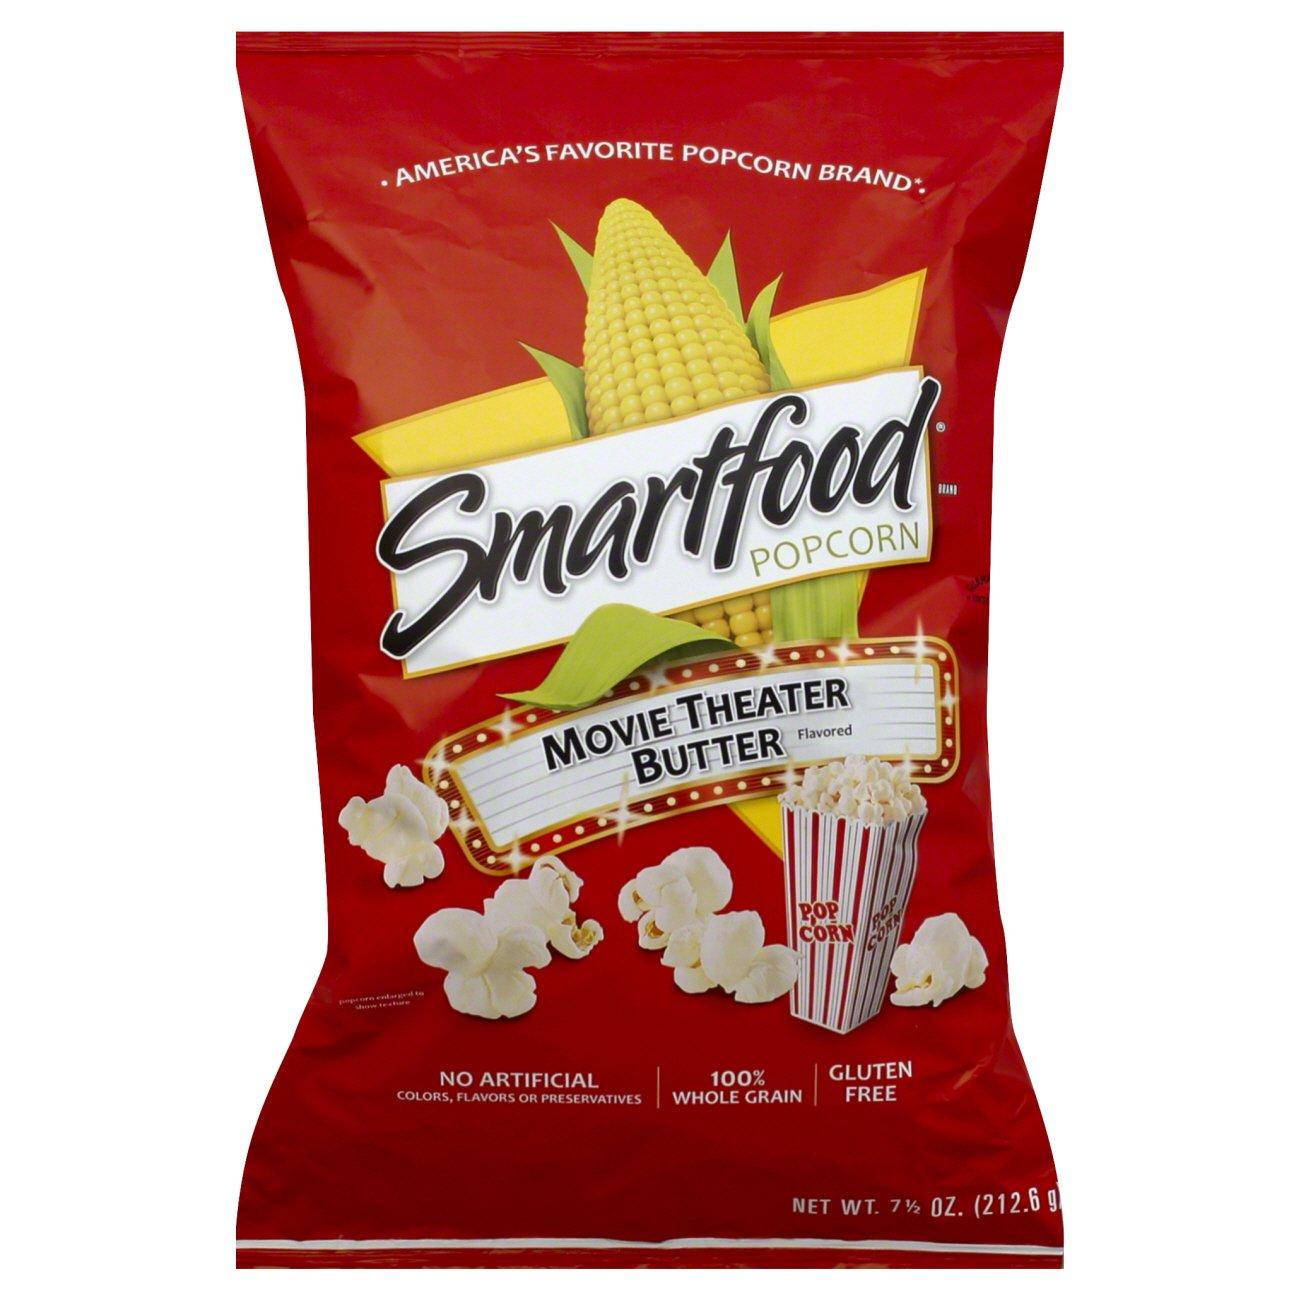 Smartfood Movie Theater Butter Popcorn Shop Smartfood Movie Theater Butter Popcorn Shop Smartfood Movie Theater Butter Popcorn Shop Smartfood Movie Theater Butter Popcorn Shop At H E B At H E B